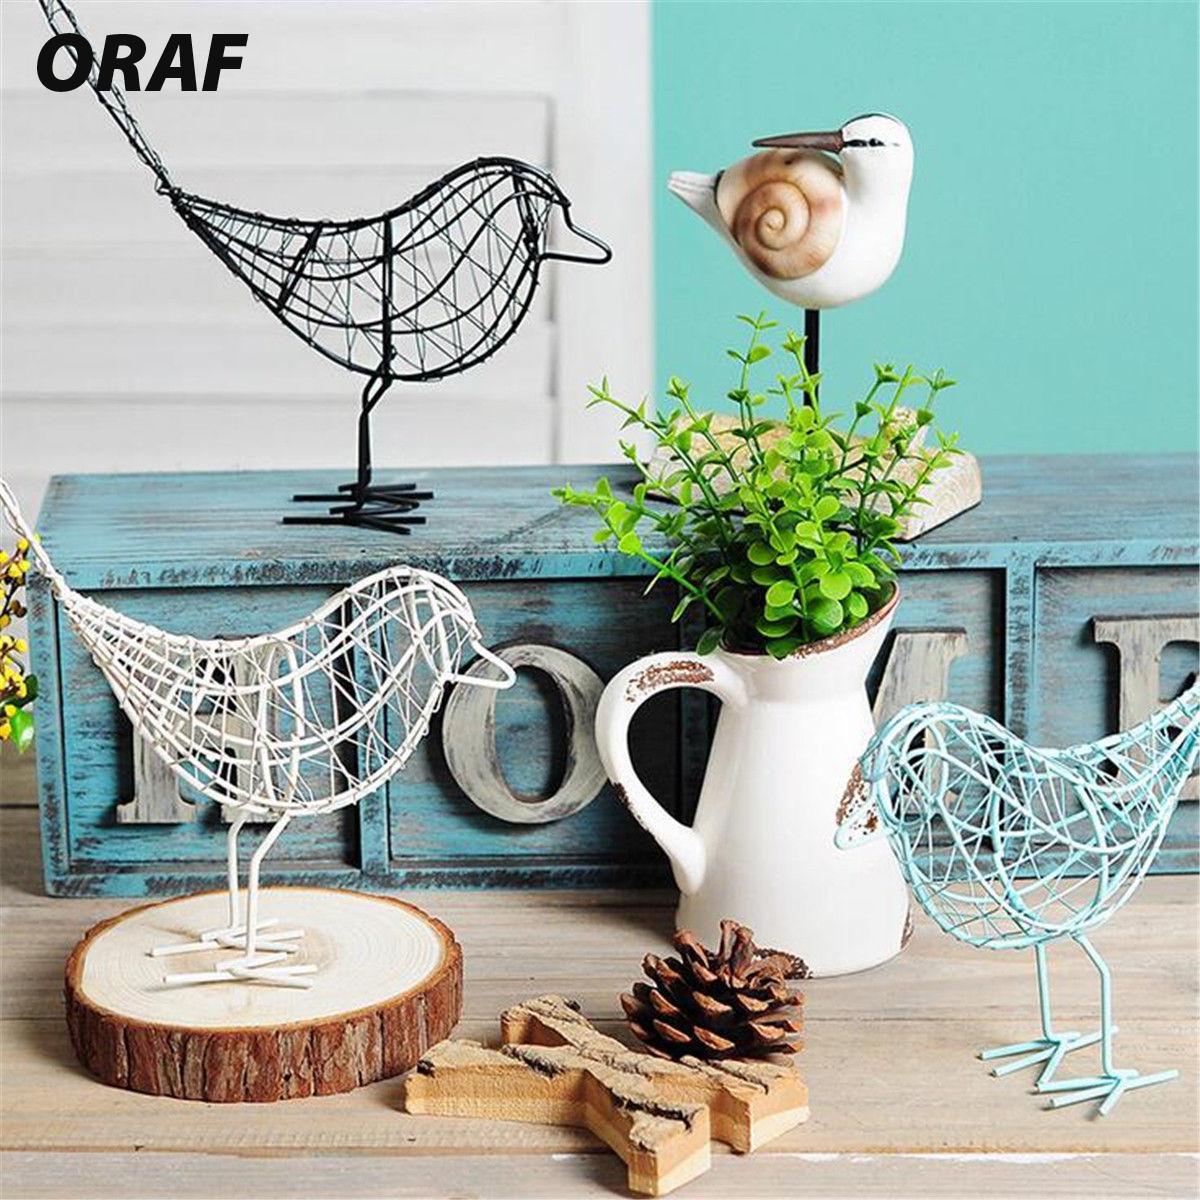 Metal Wire Iron Bird Home Furnishing Ornaments White/Black/Blue Contemporary Iron Wire Bird Home Decor Ornament Beautiful Craft